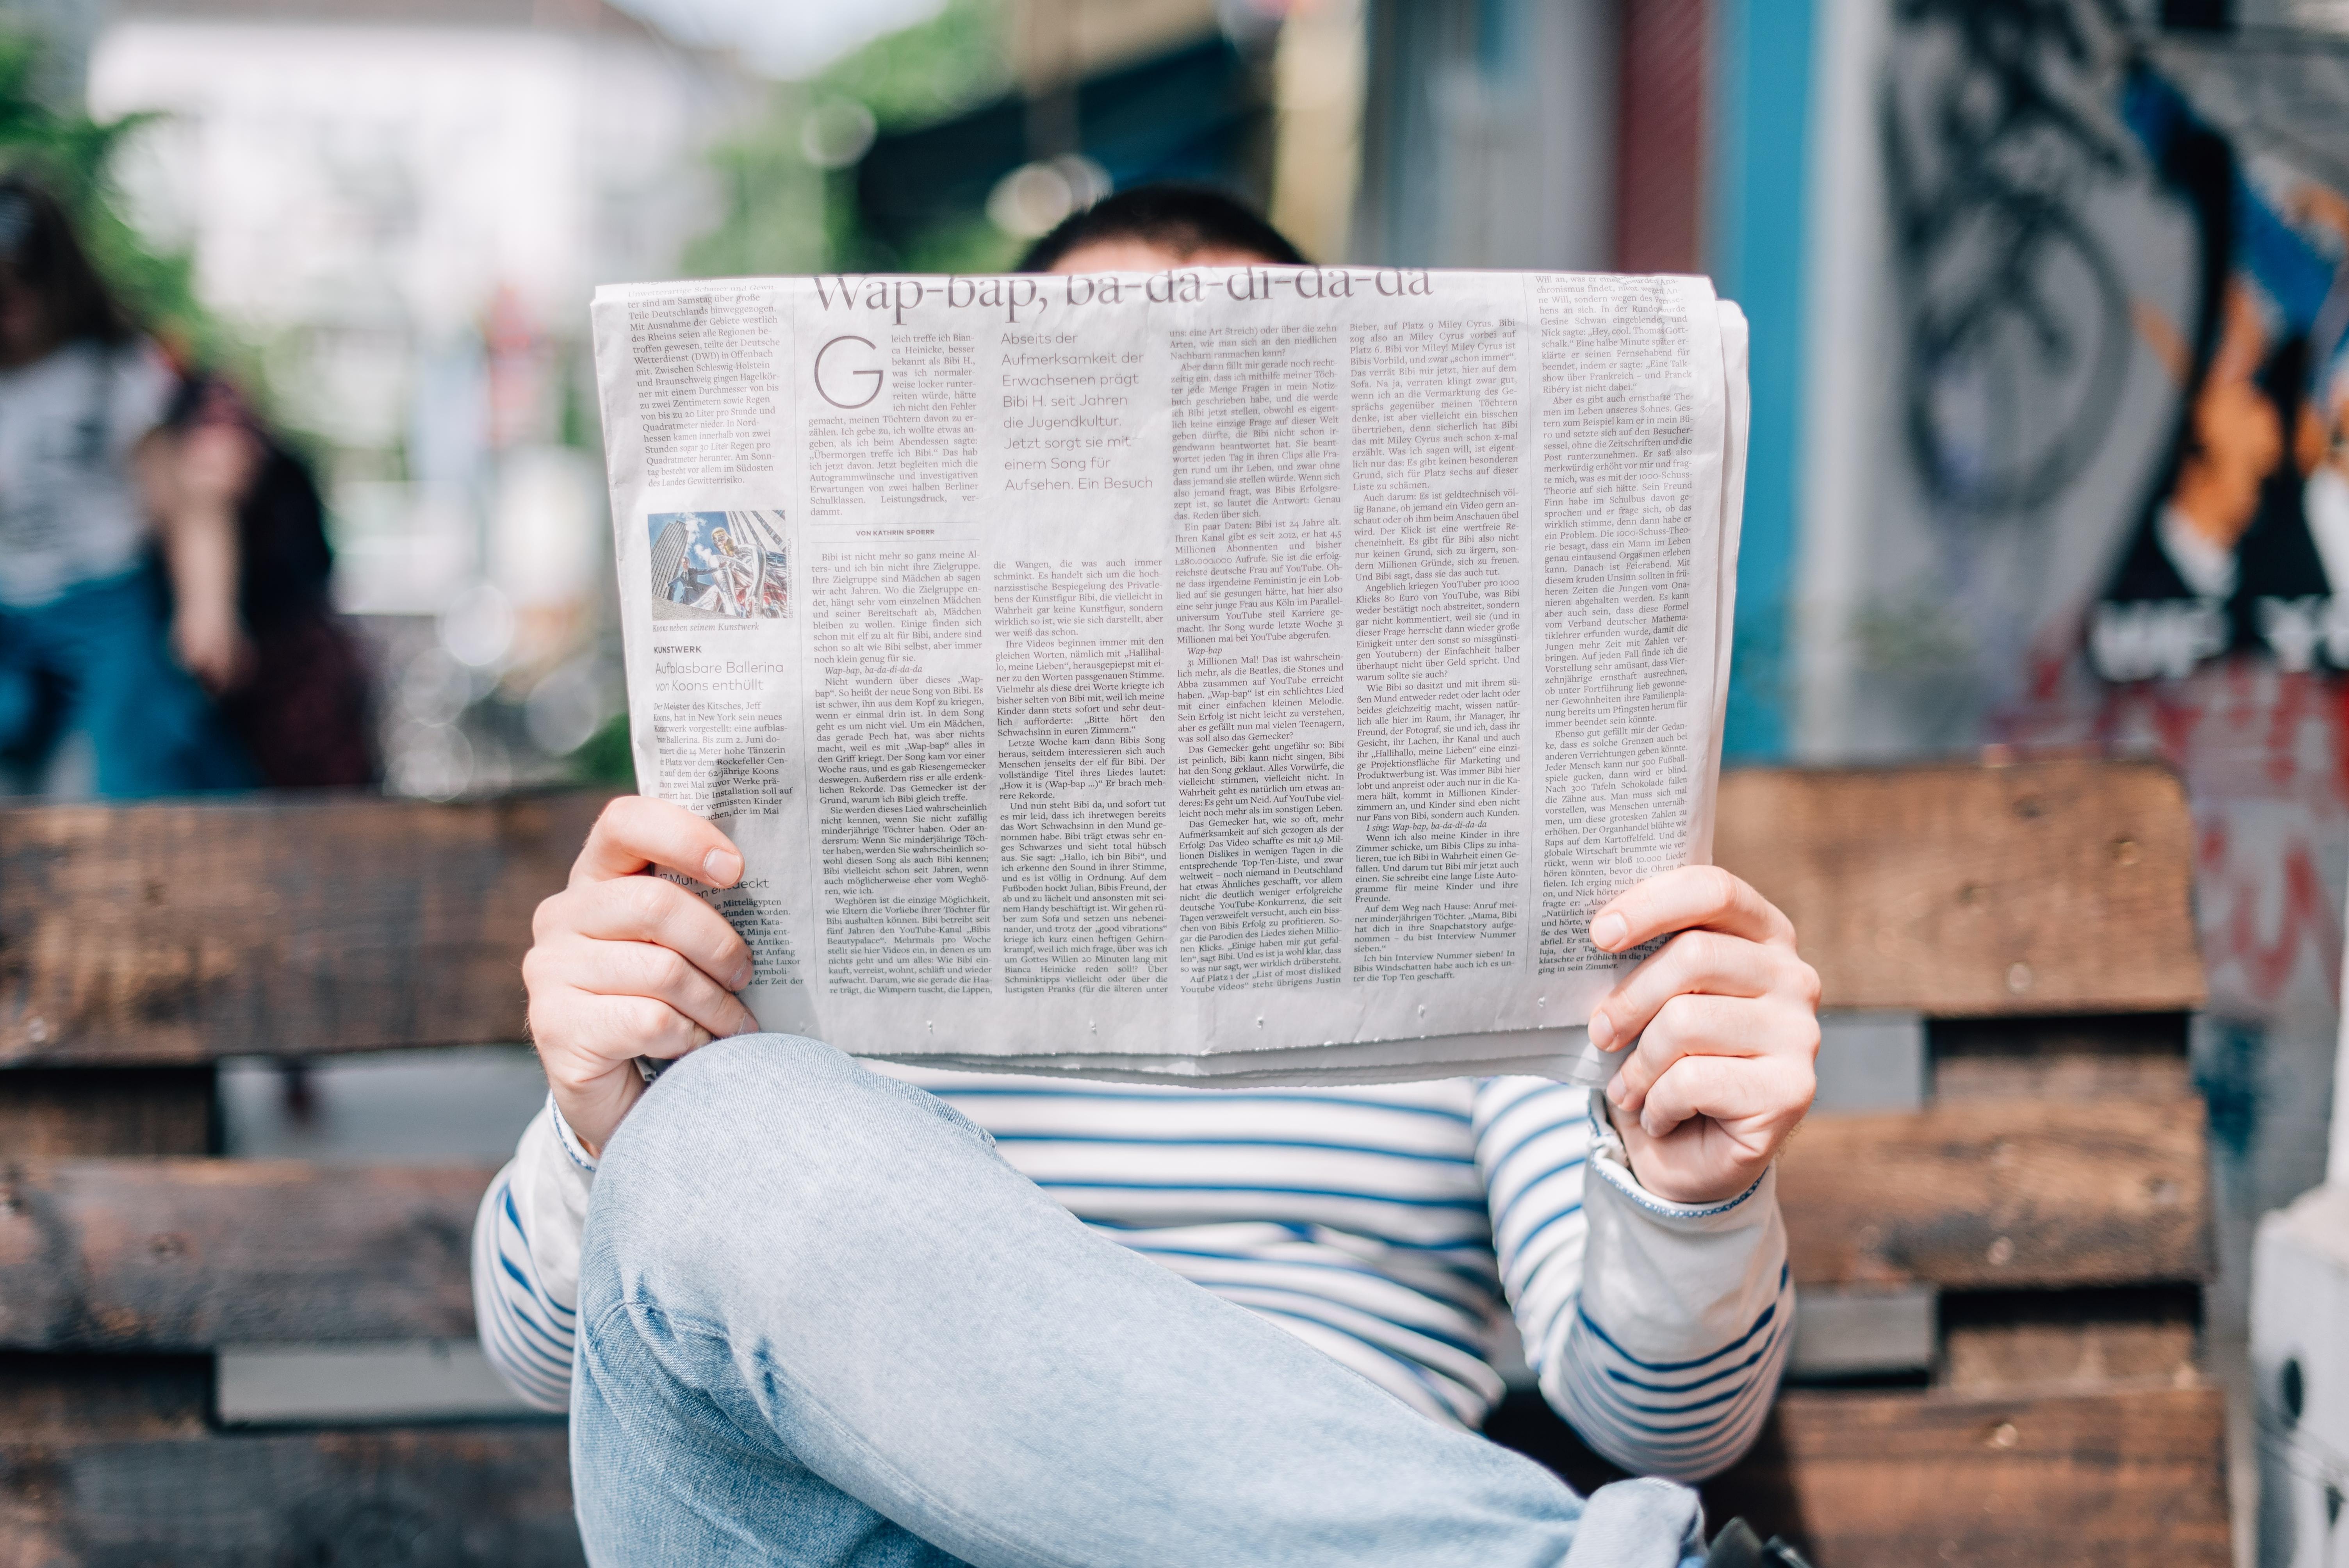 You should use print advertising alongside digital marketing